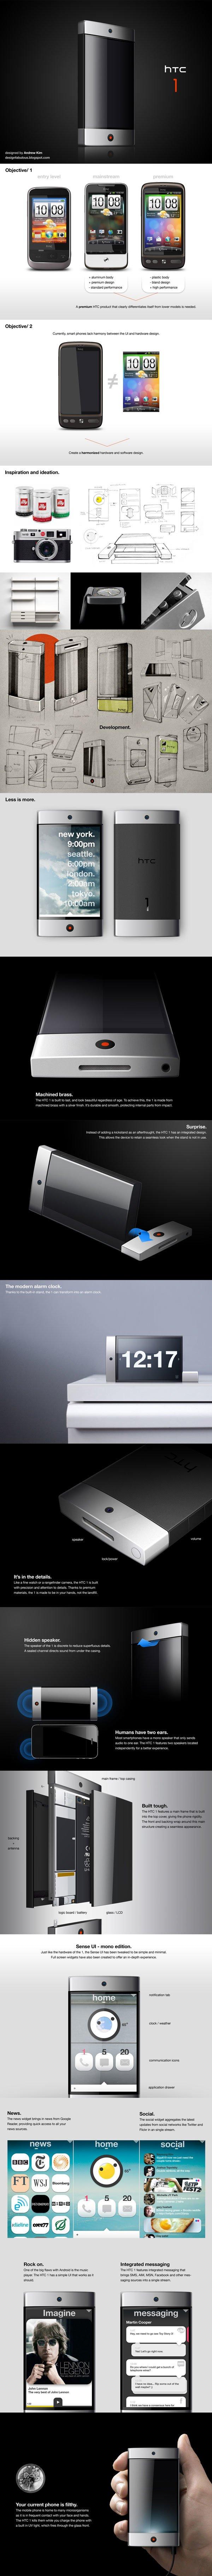 Концепт смартфона HTC 1